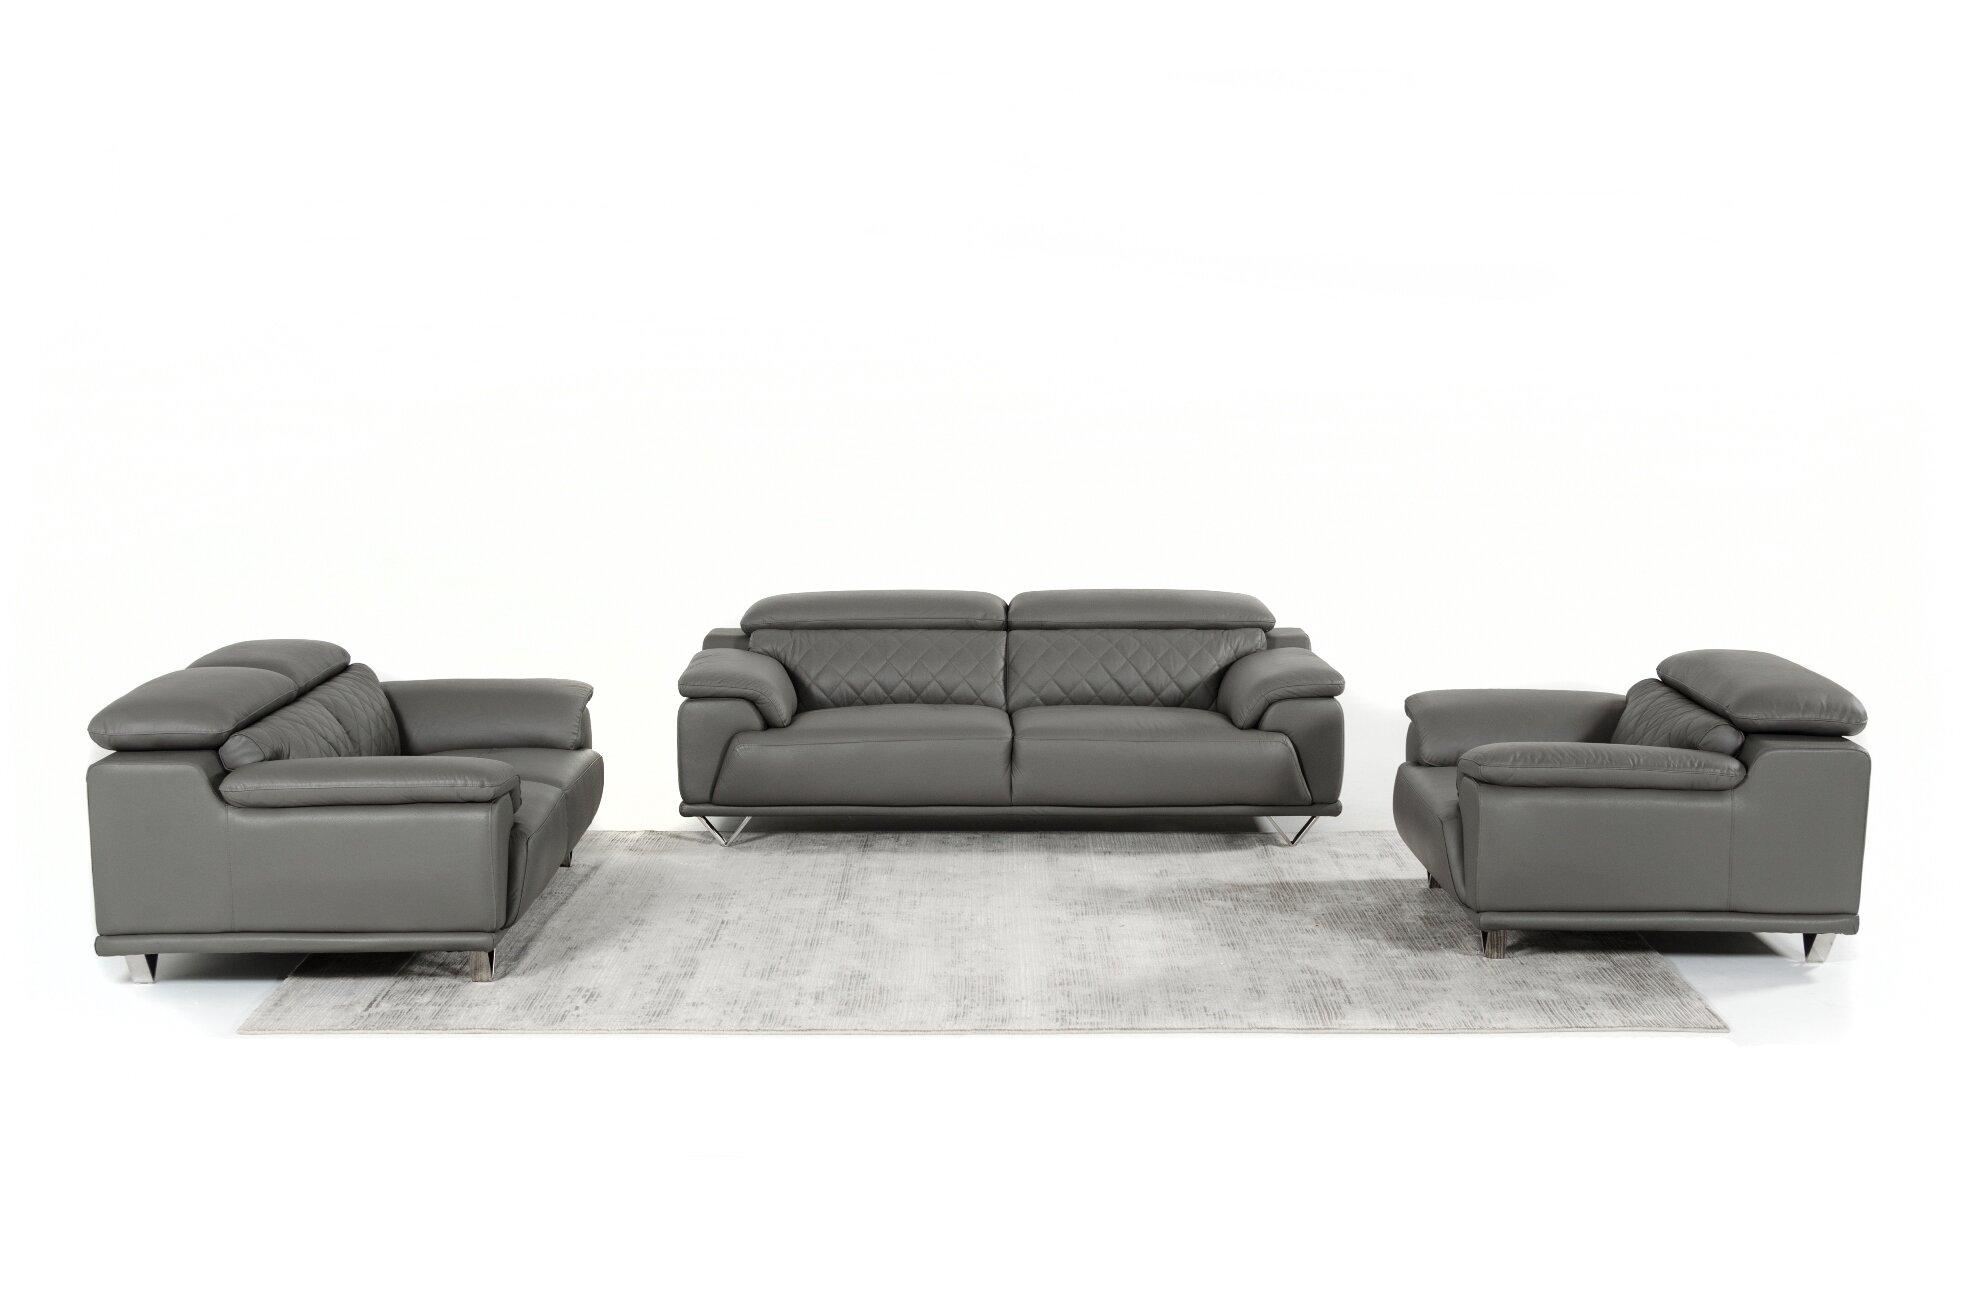 Cardinale 3 Piece Leather Living Room Set